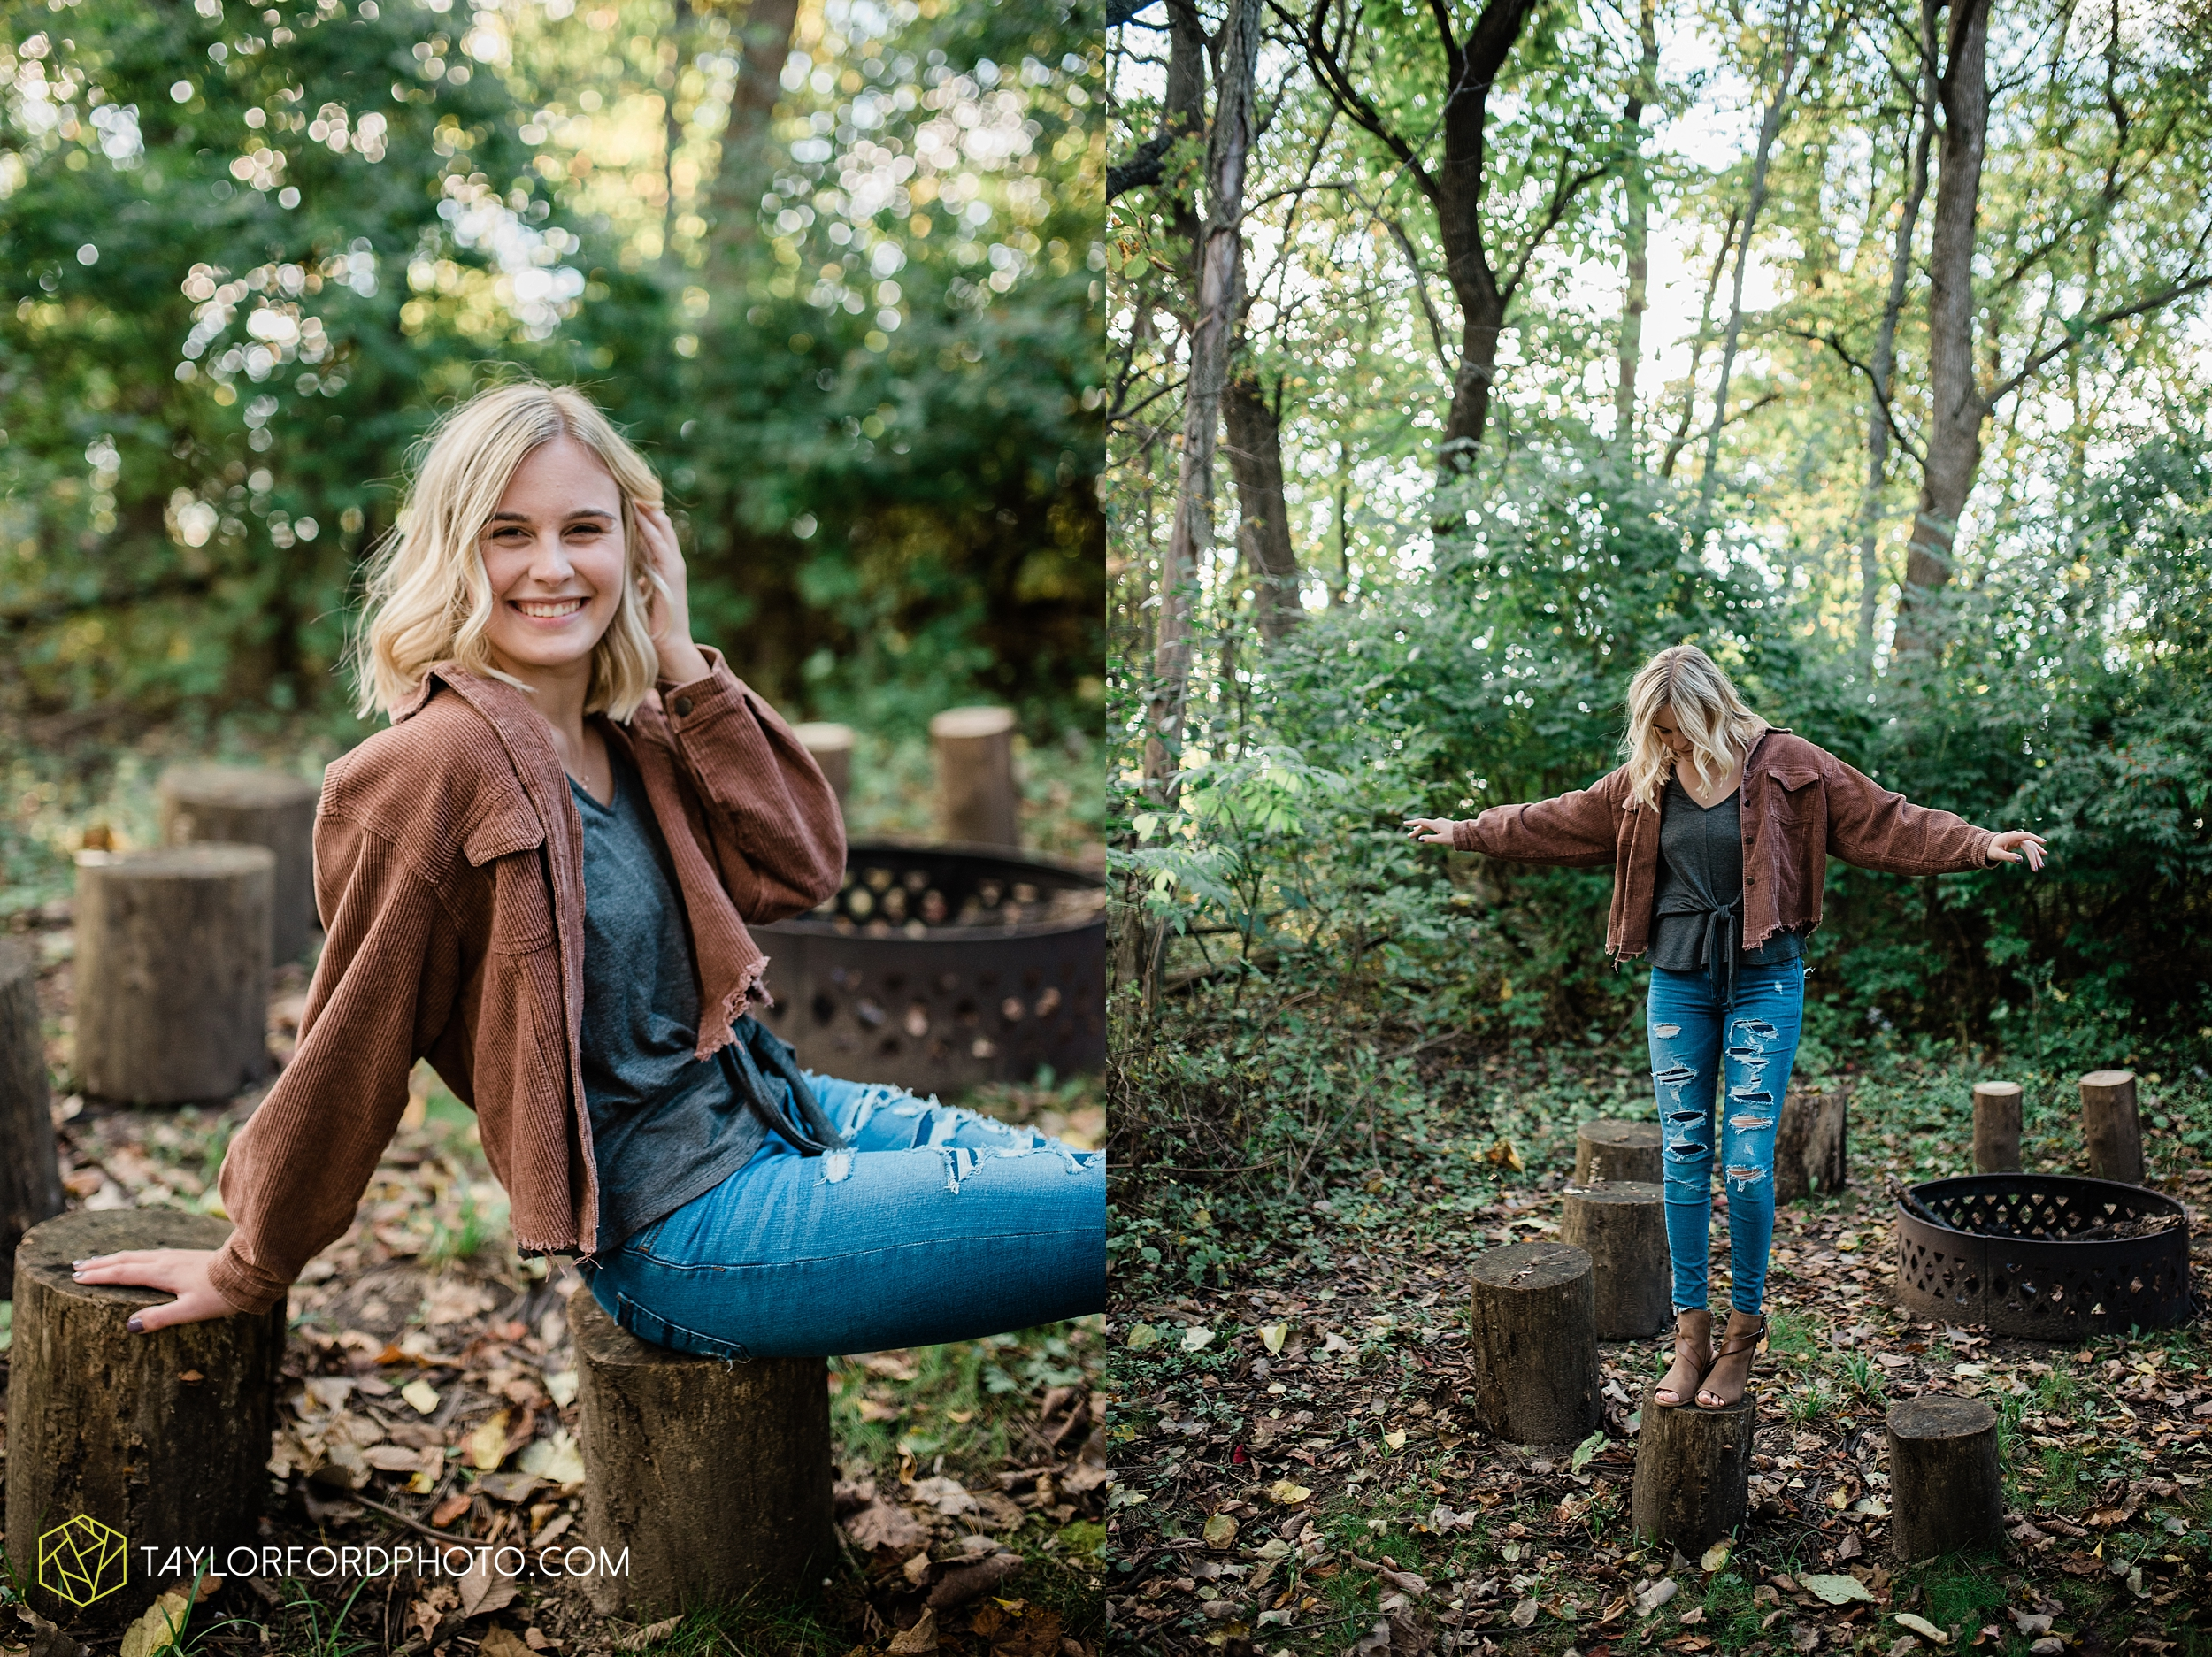 van-wert-high-school-ohio-senior-girl-downtown-cougar-photographer-taylor-ford-photography_0945.jpg